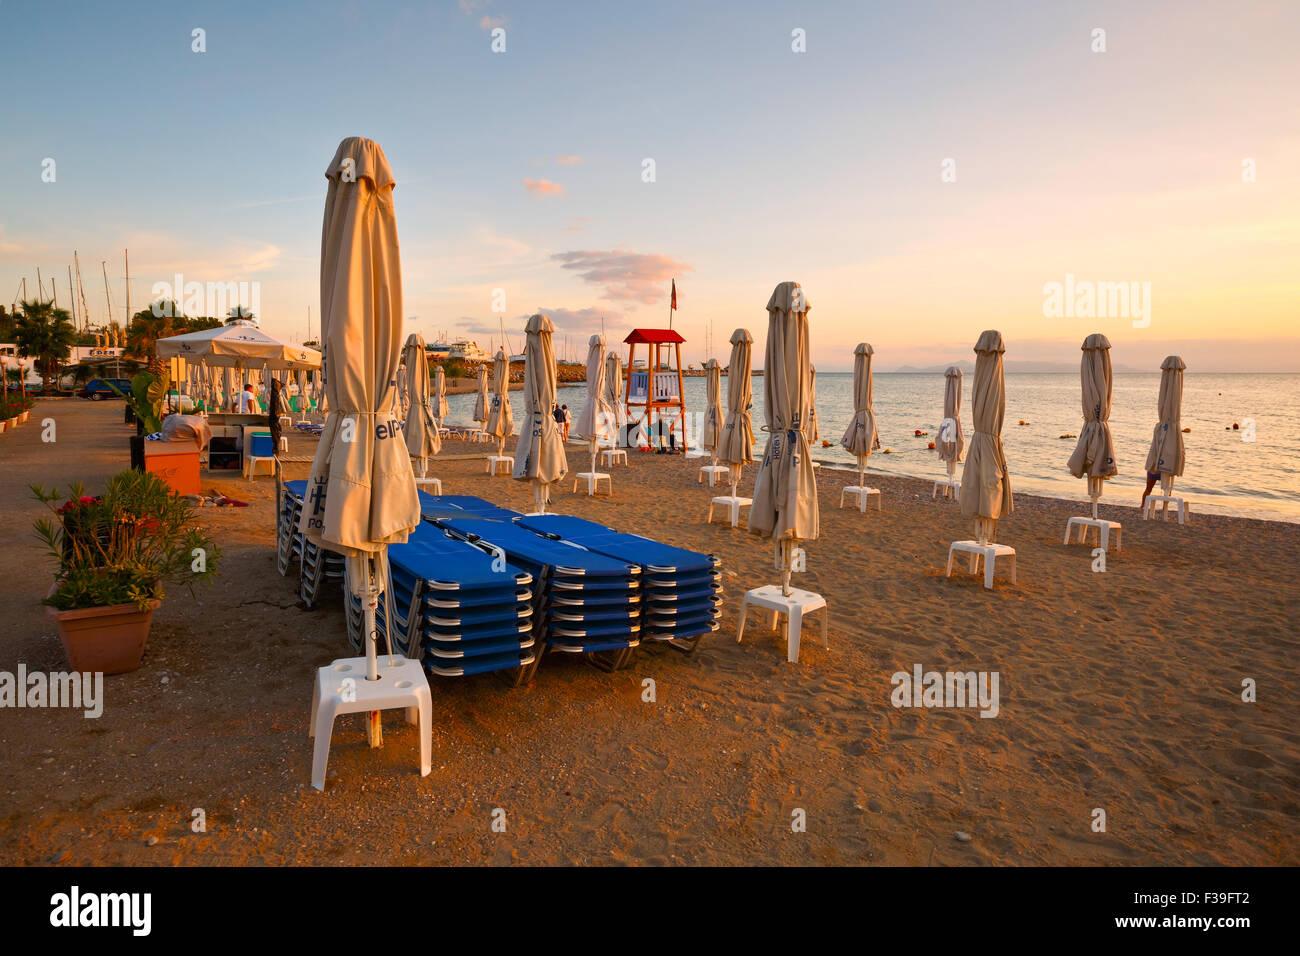 Sonnenschirme am Strand in Palaio Faliro in Athen, Griechenland Stockbild